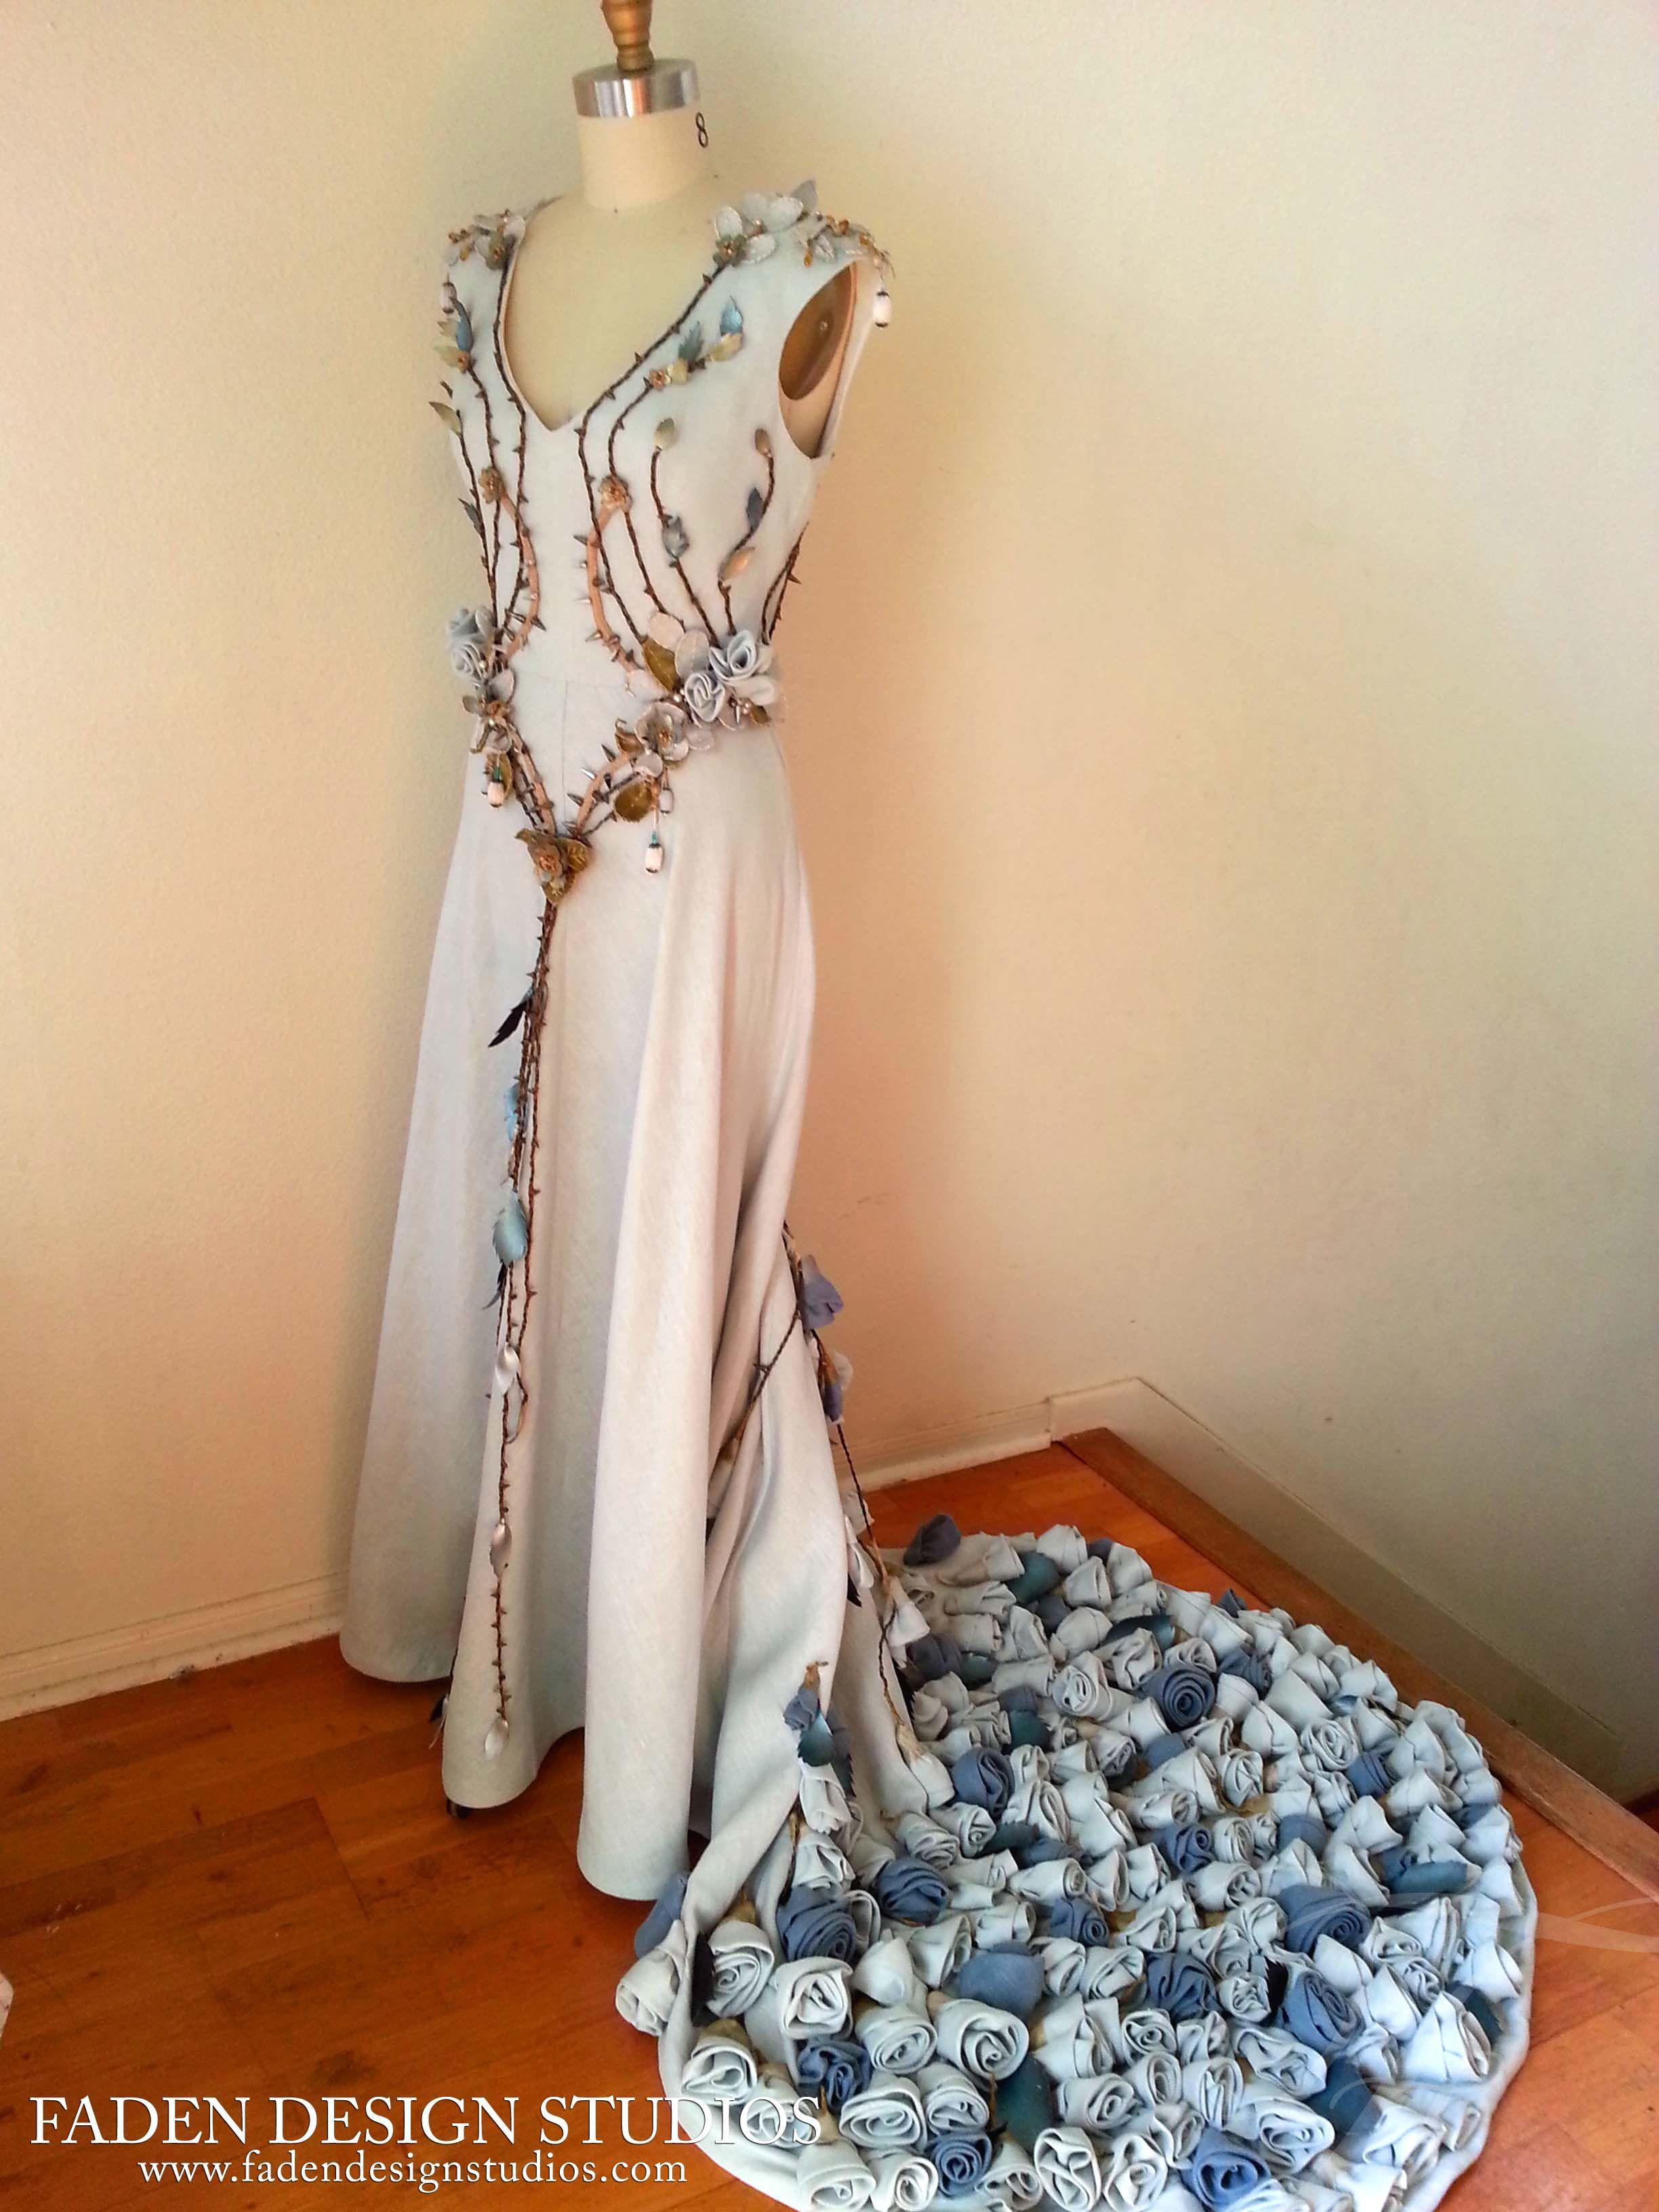 New Faden Design Studios The Margaery Tyrell Wedding Dress Faden Design Studios